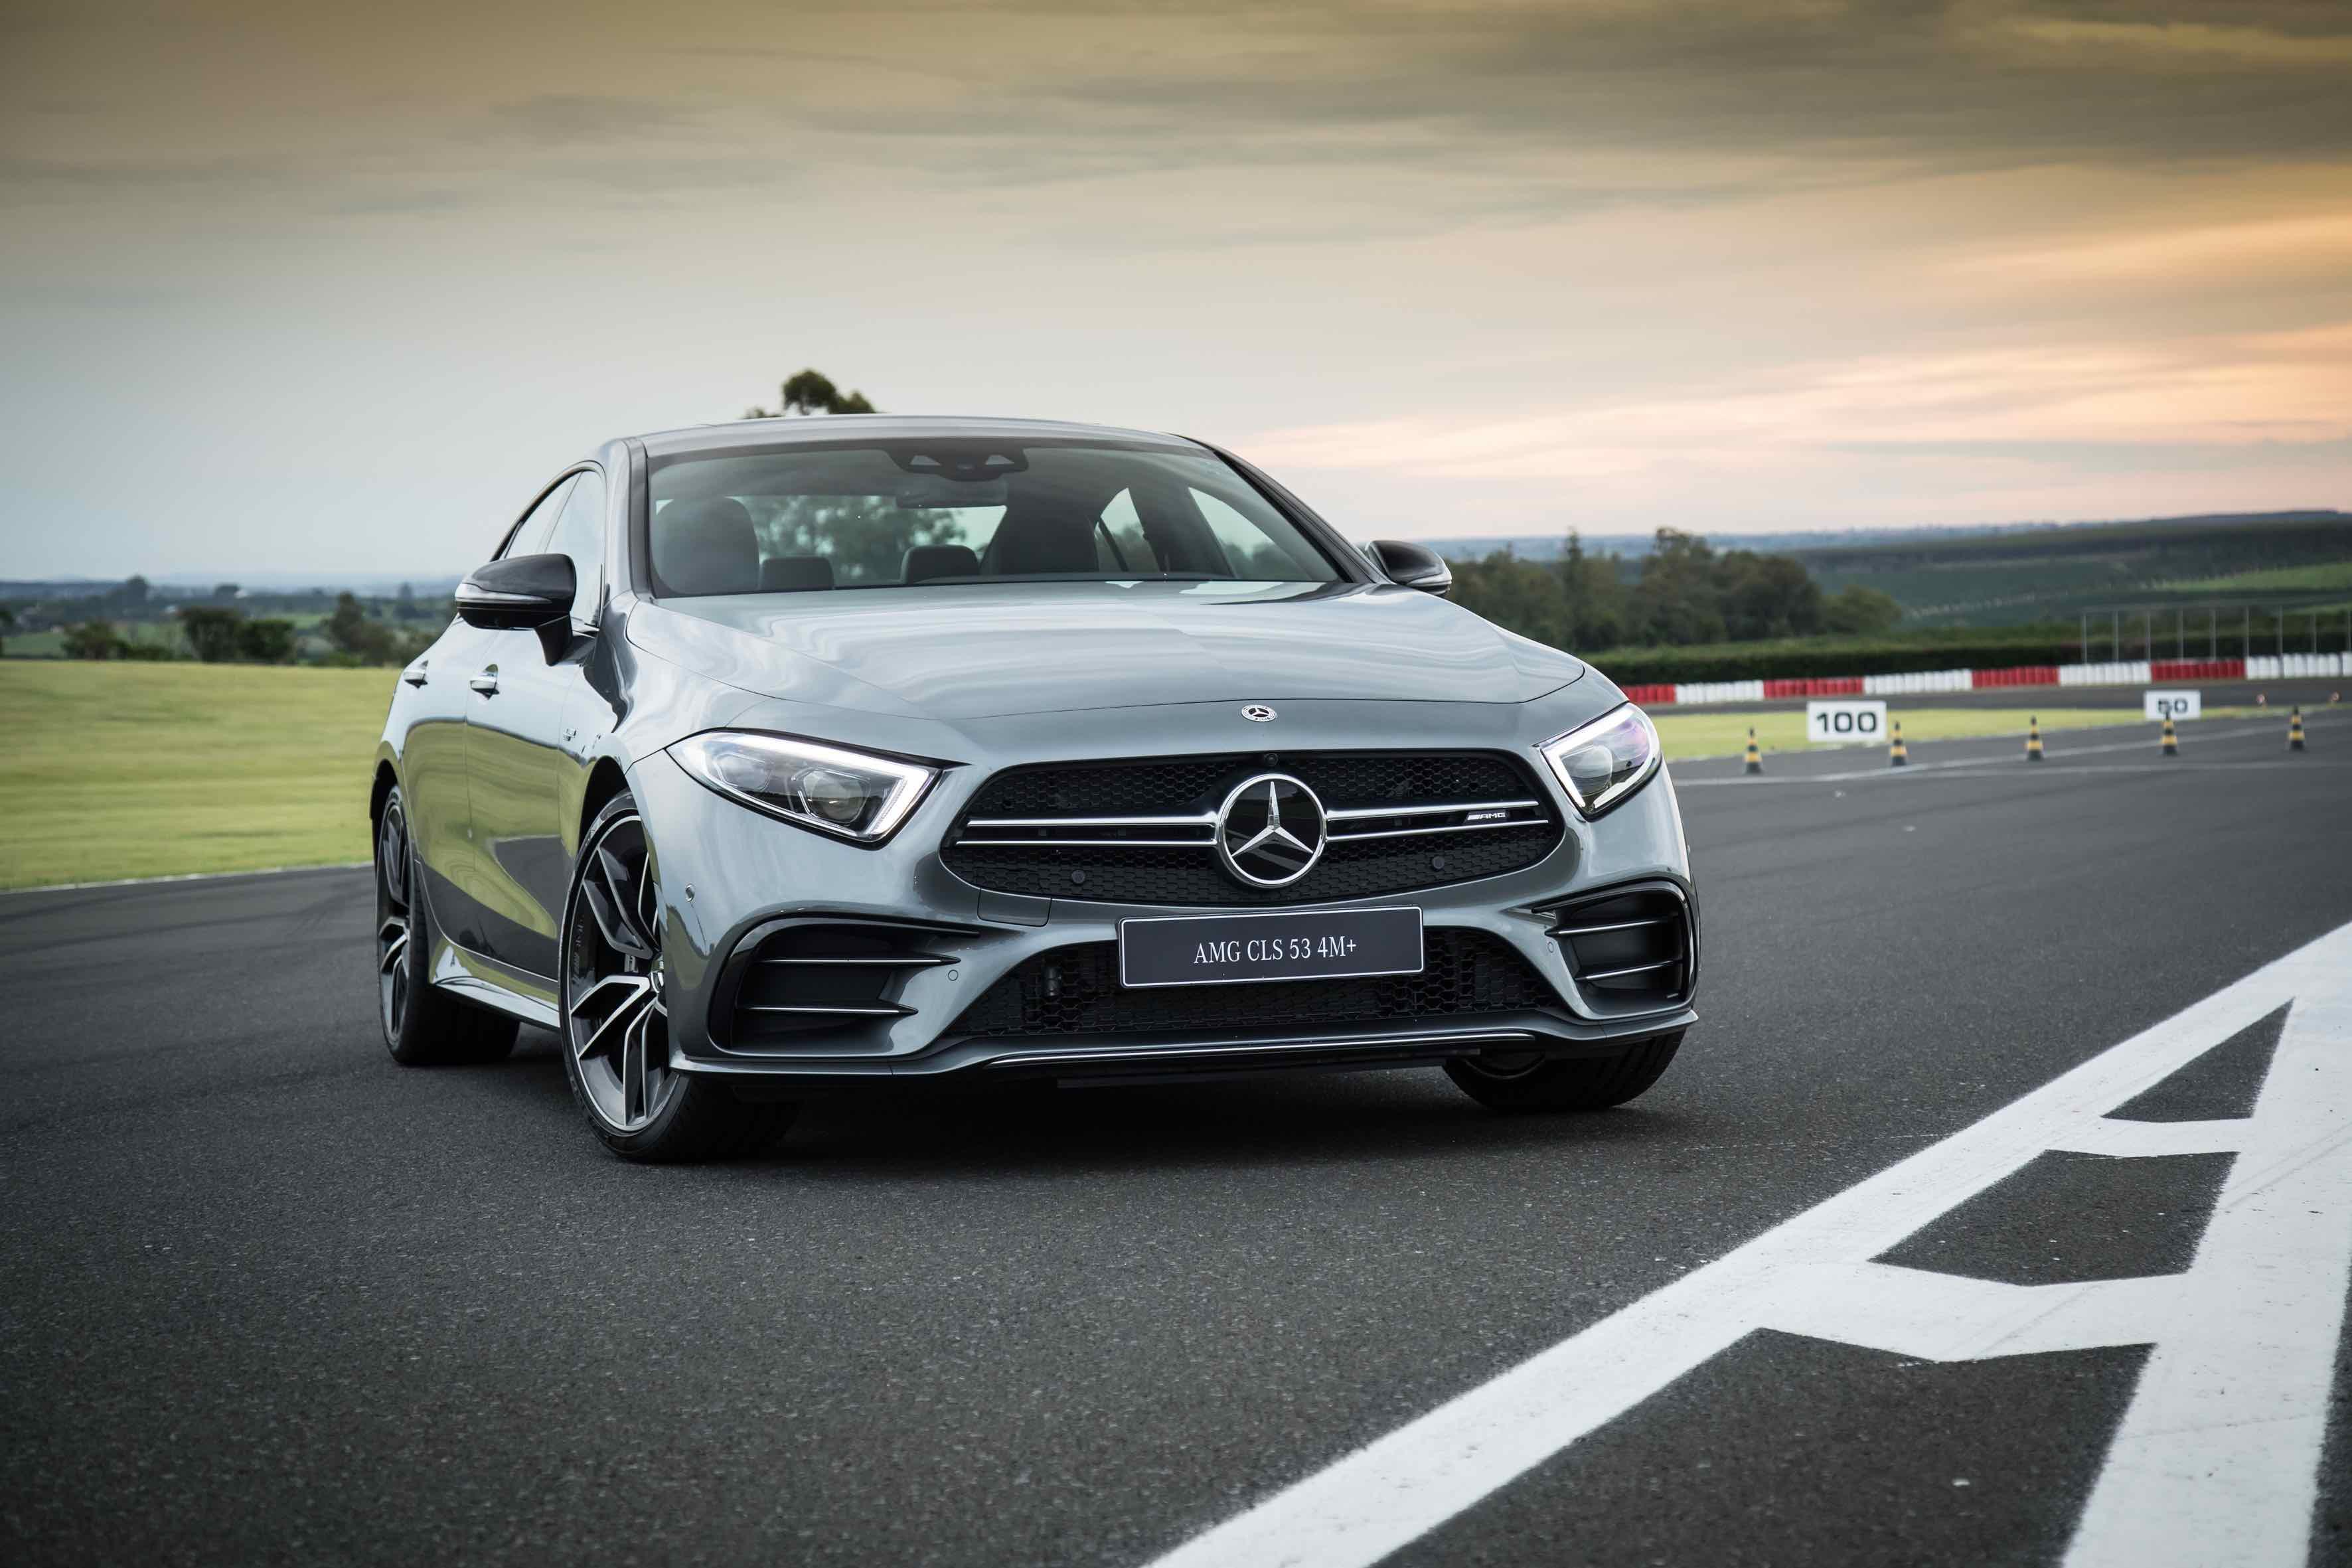 Mercedes-Benz AMG GLC 63 AMG Performance Tour 2018